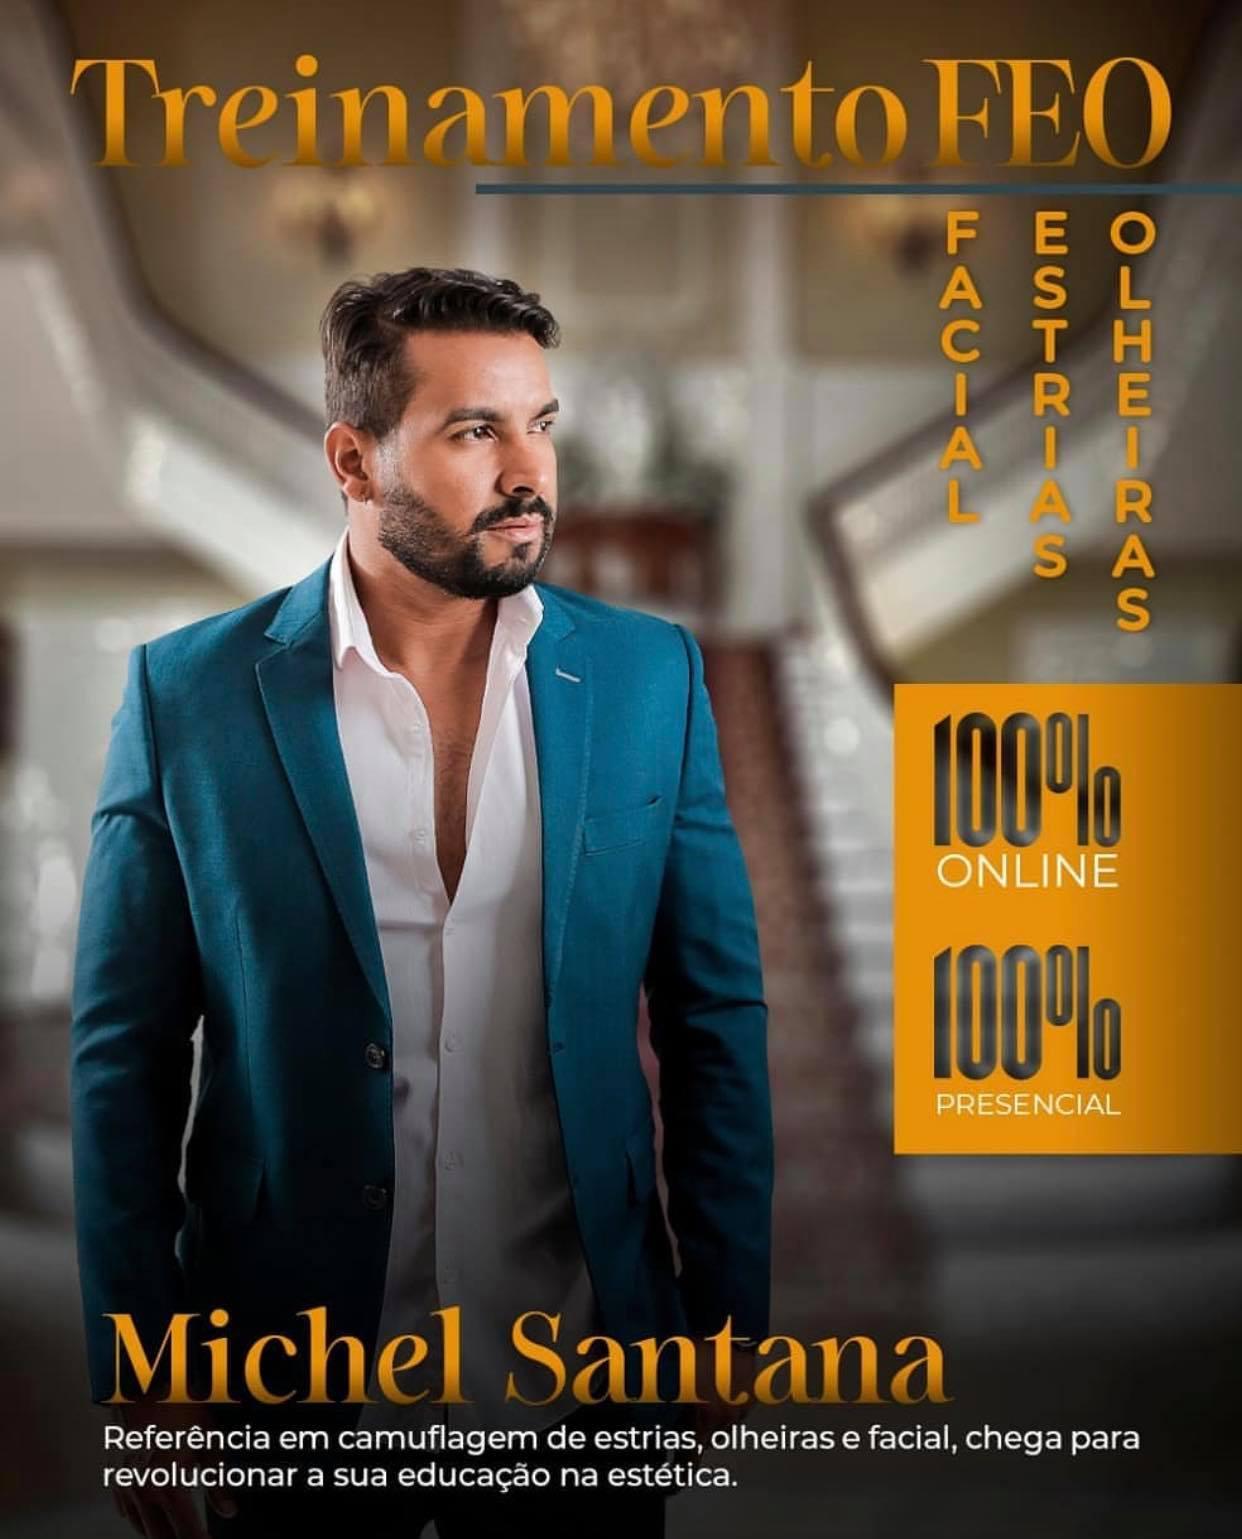 Michel Santana